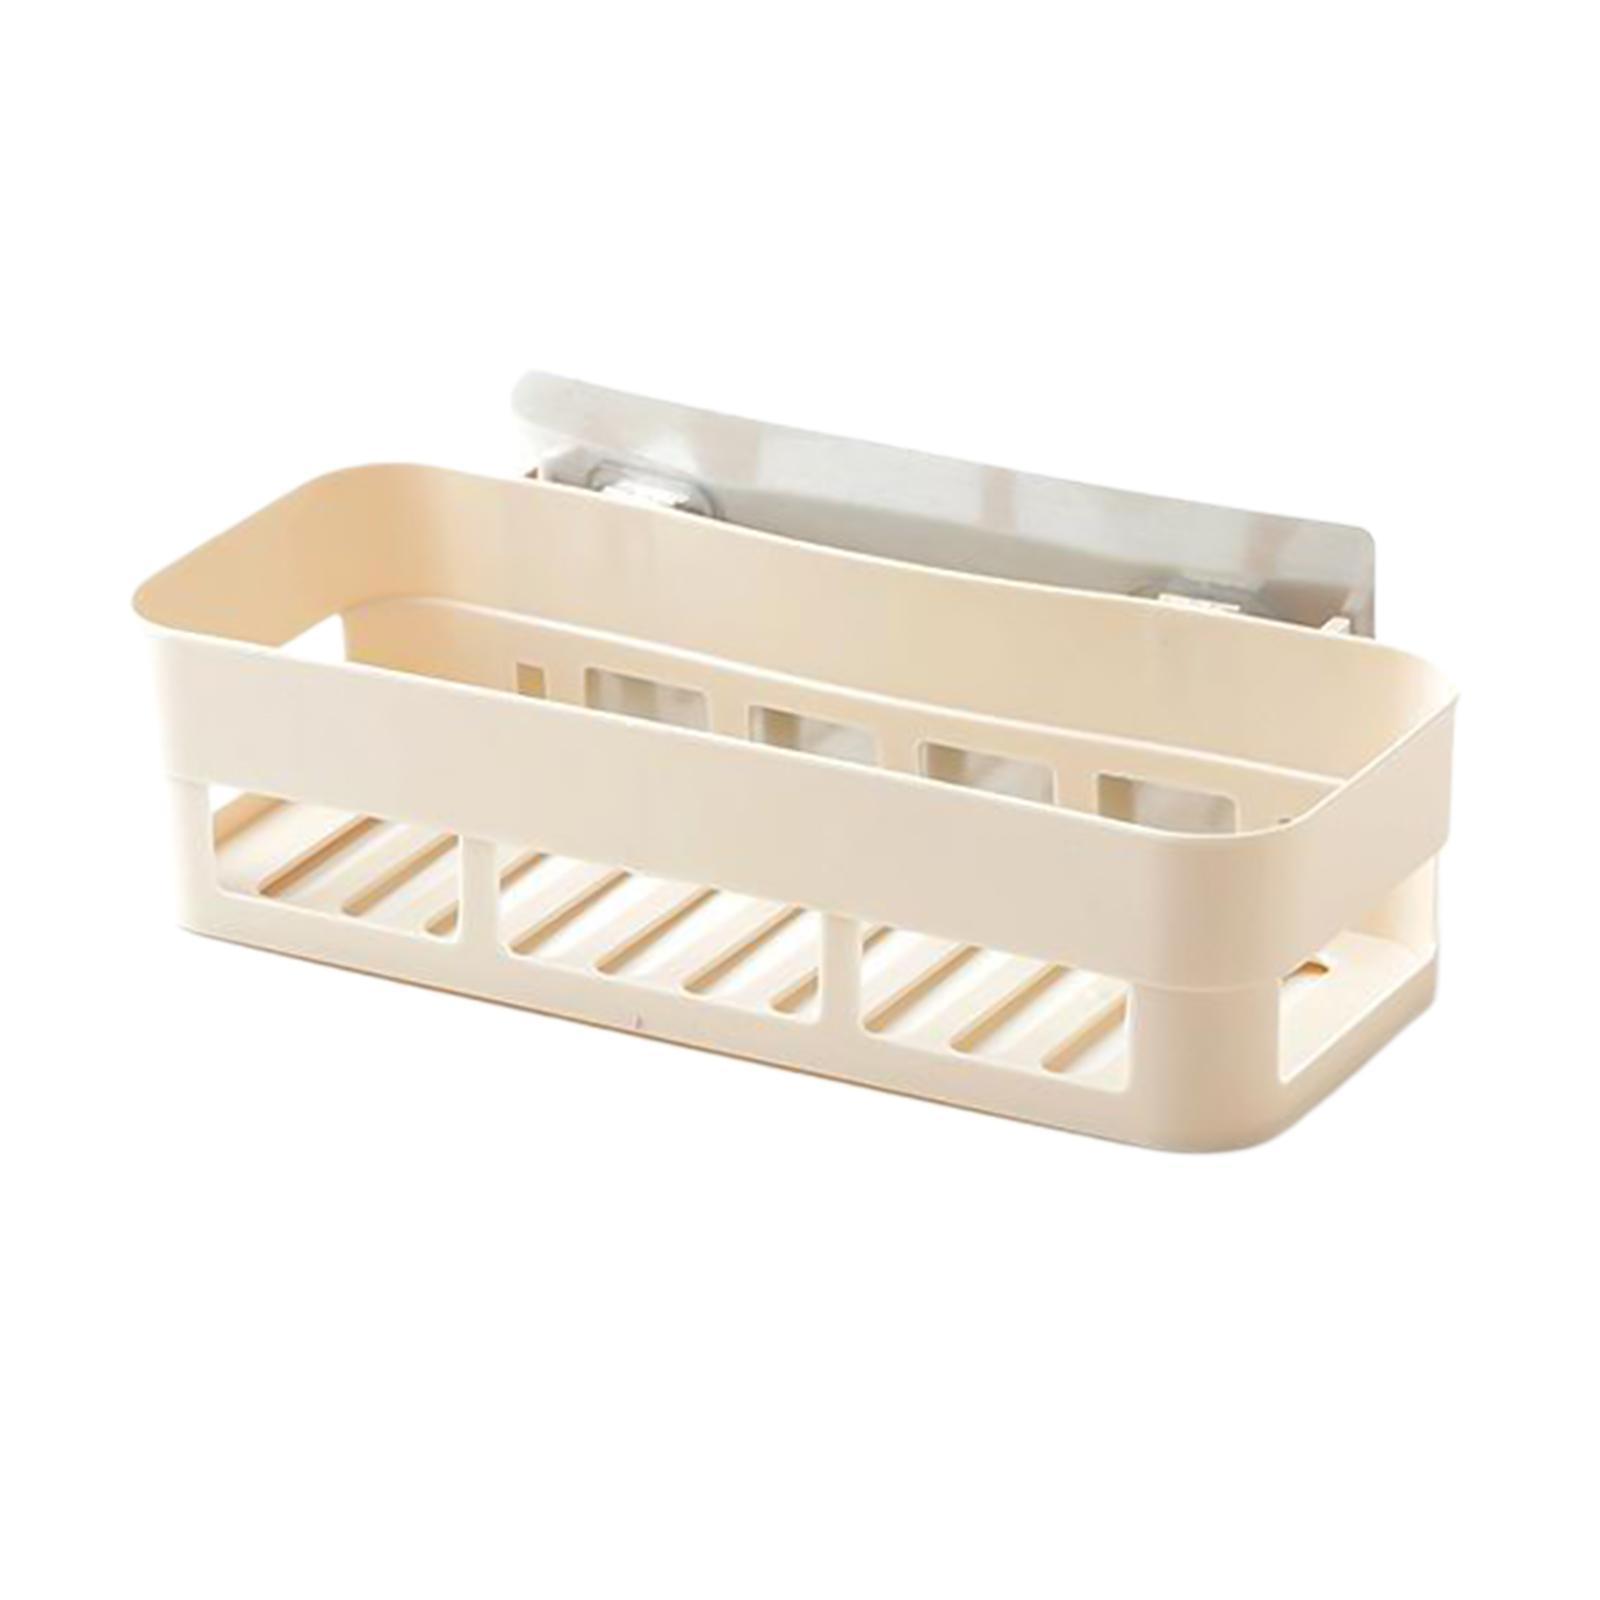 thumbnail 9 - Self-Adhesive-Shower-Shelf-Plastic-Shower-Caddy-Organiser-Bathroom-Shelf